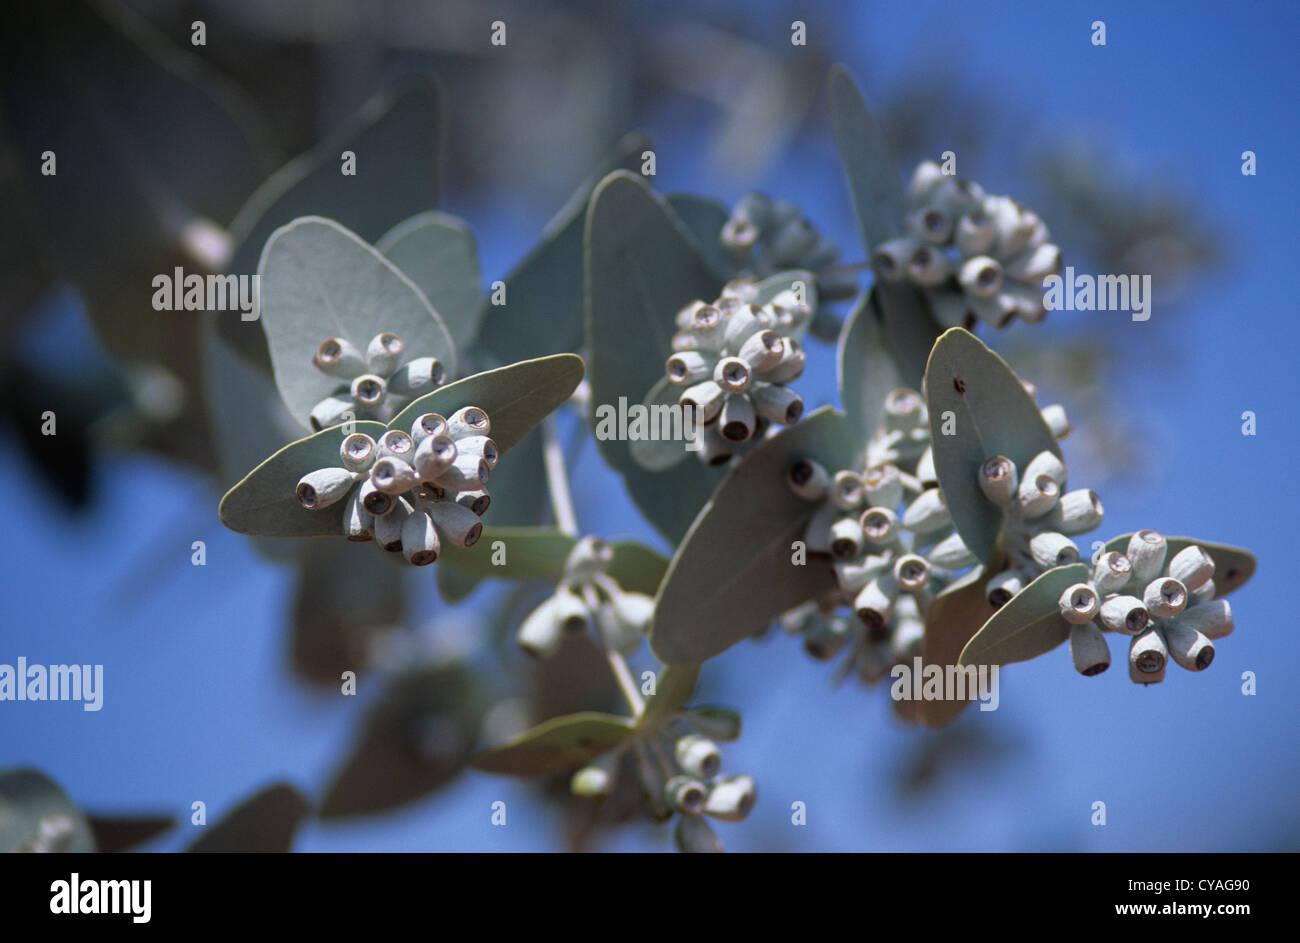 Australia native plantsflowers eucalyptus leaves and flower buds australia native plantsflowers eucalyptus leaves and flower buds species unidentified taken near alice springs mightylinksfo